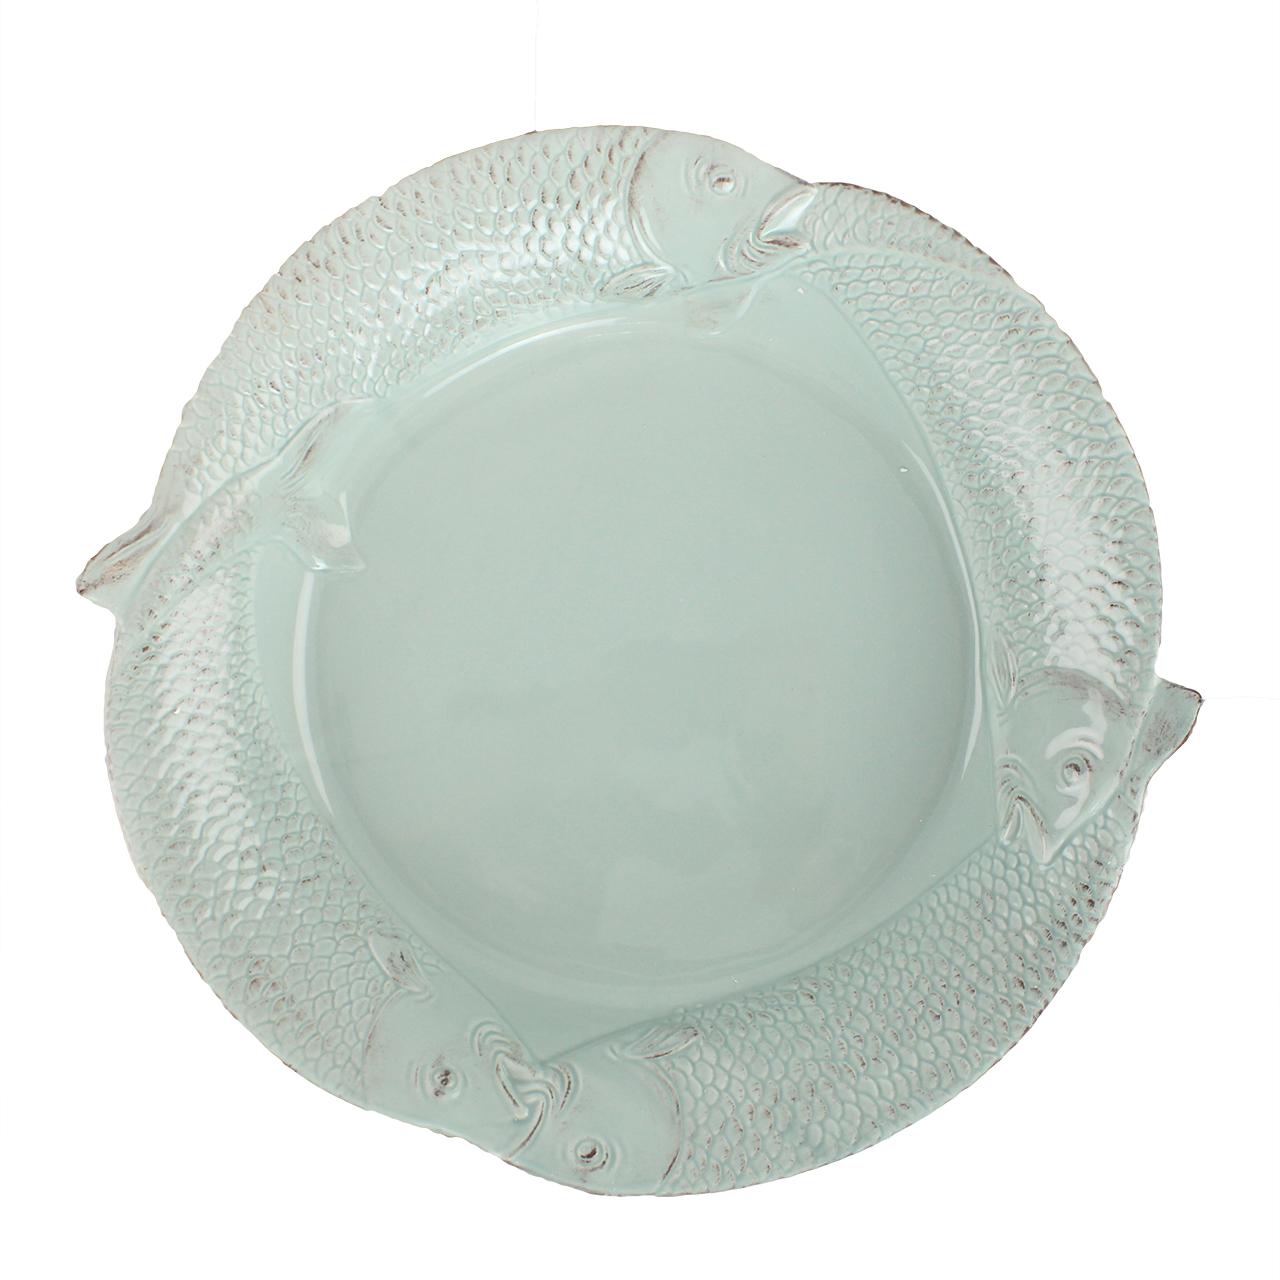 Farfurie Din Ceramica Vernil Cu Pesti